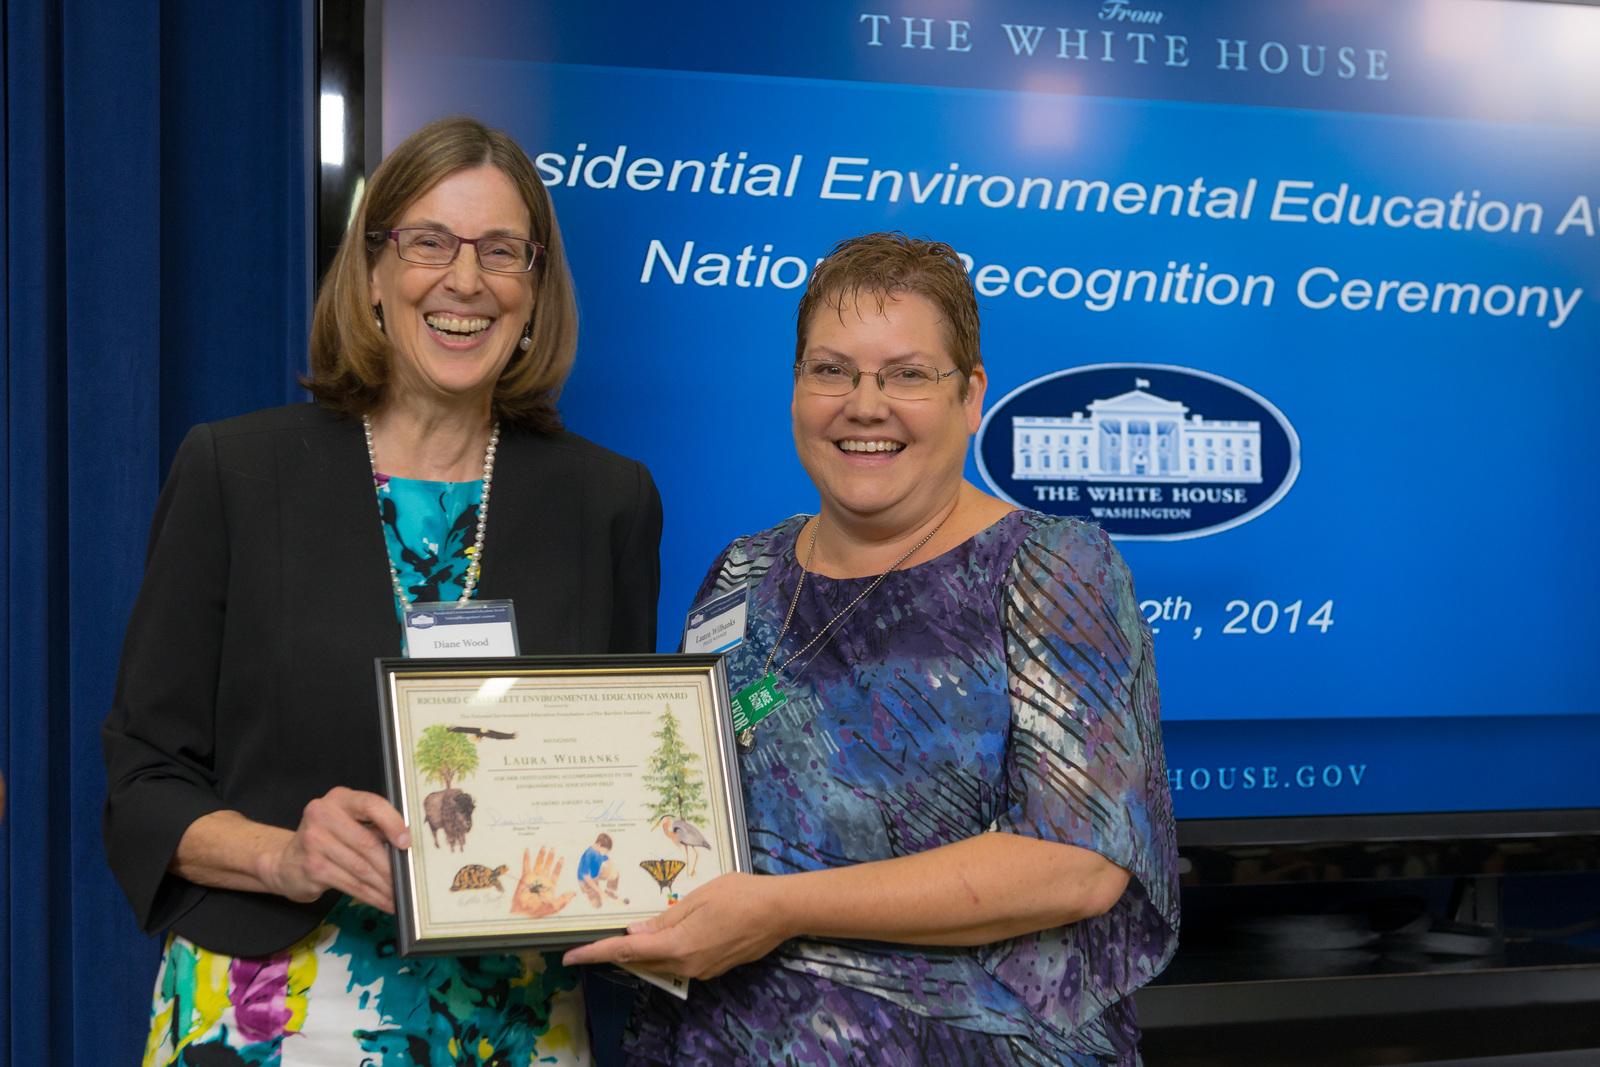 President's Environmental Youth Awards - Presidential Environmental Education Awards [412-APD-1423-2014-08-12_PEYA_227.jpg]